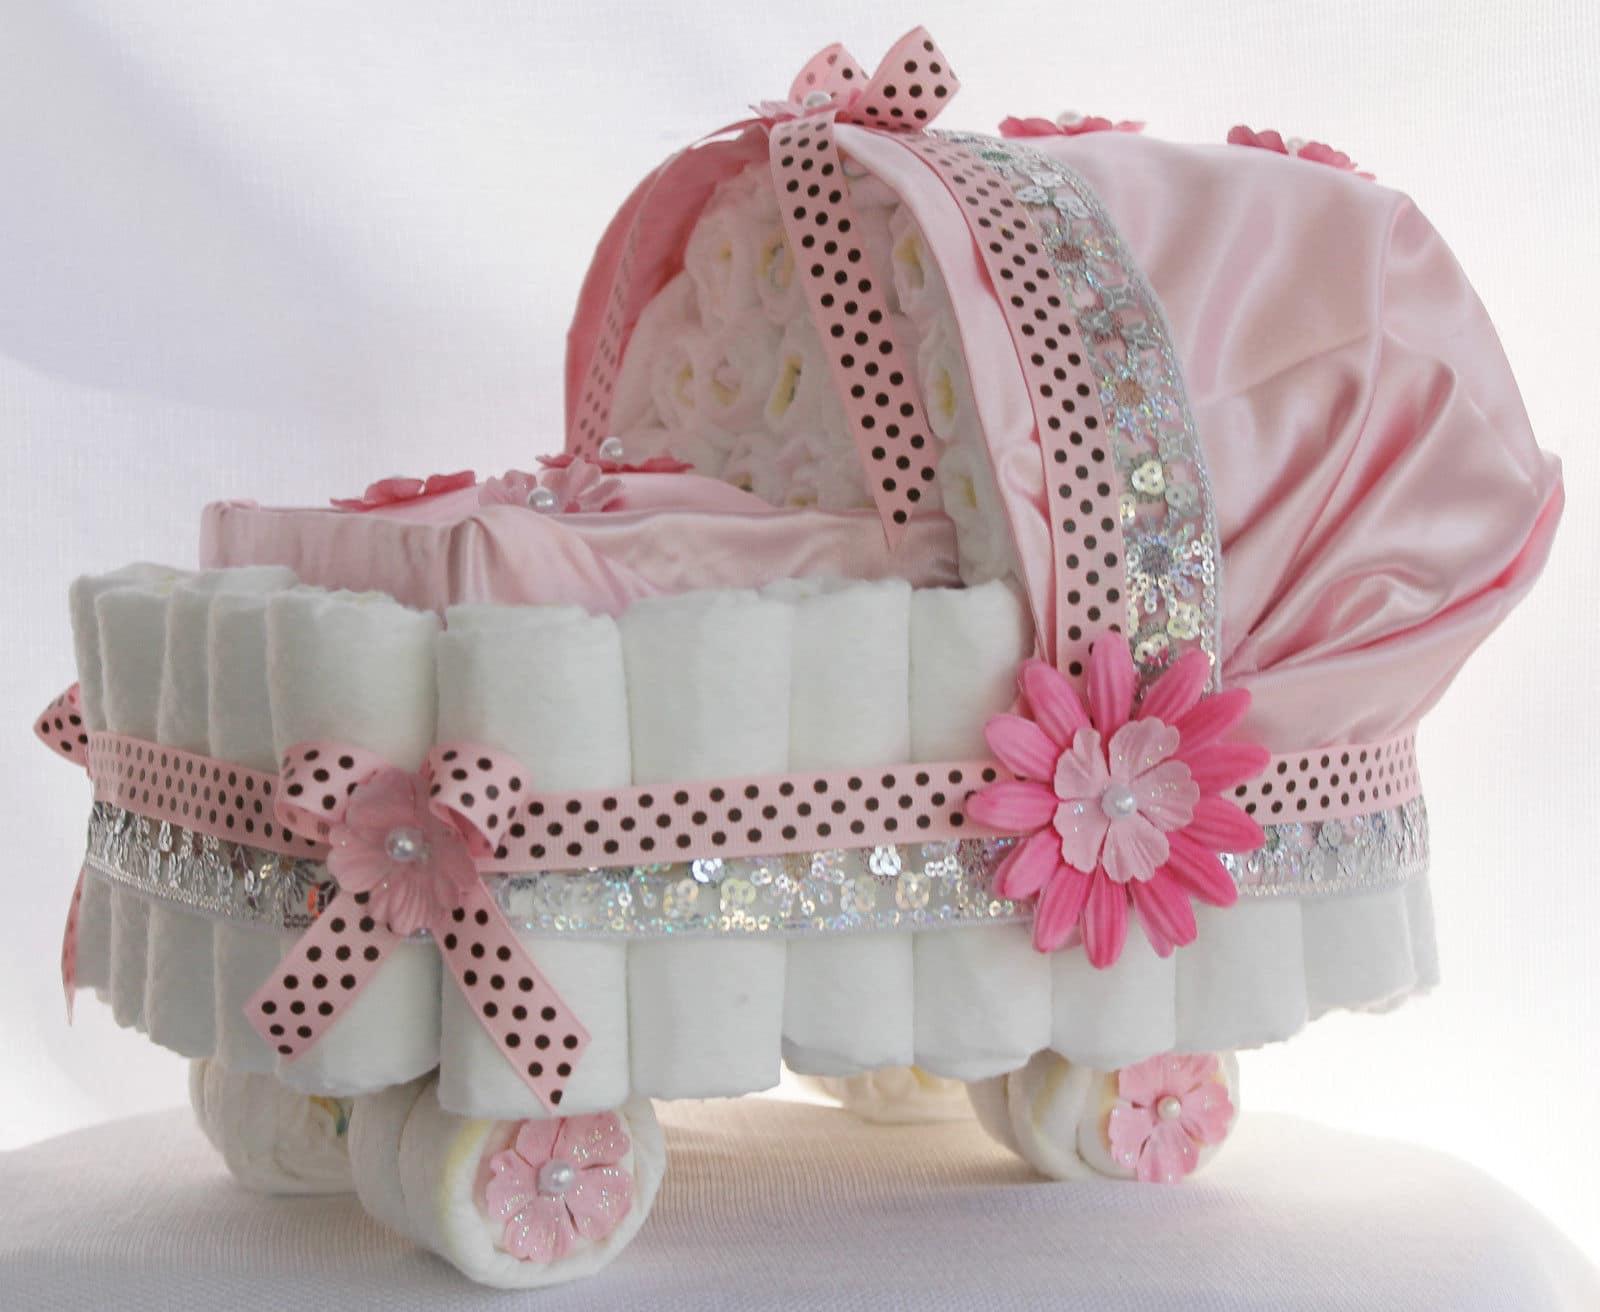 Read more about the article Modelos de bolos de fraldas fáceis de fazer